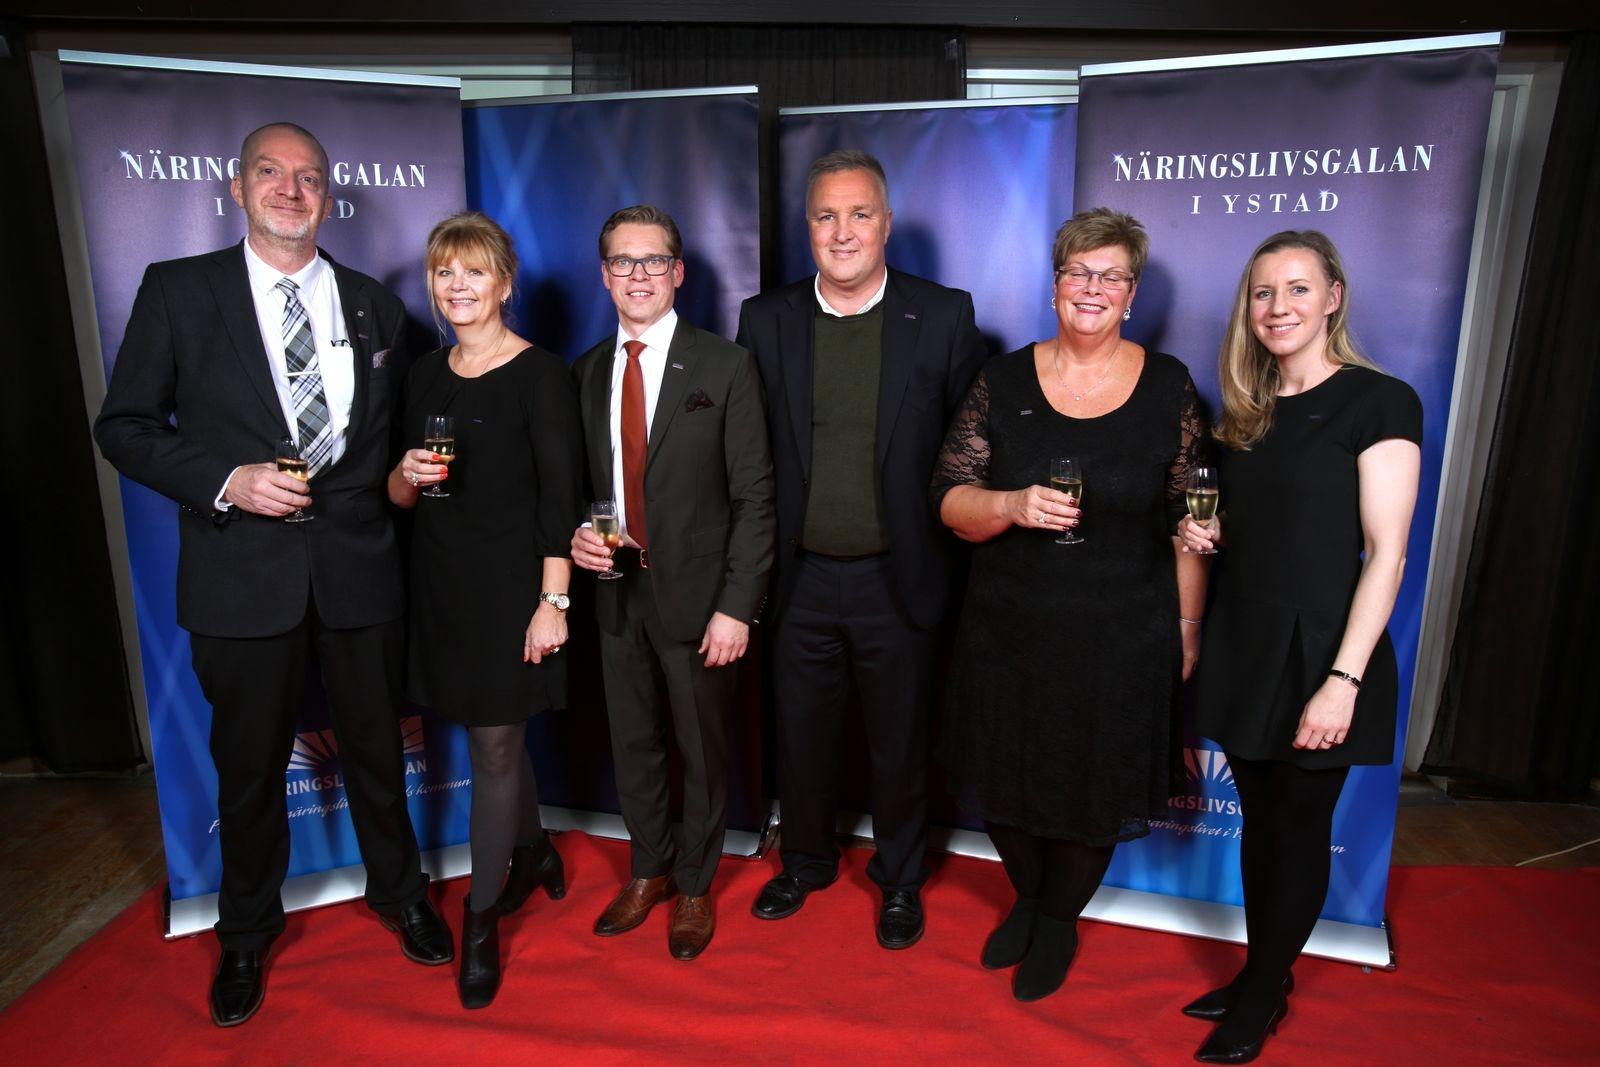 Lars Nilsson, Liz Solander, Göran Arnesson, Paul Persson, Rita Hallgren, Yasmine Fort, Nordea